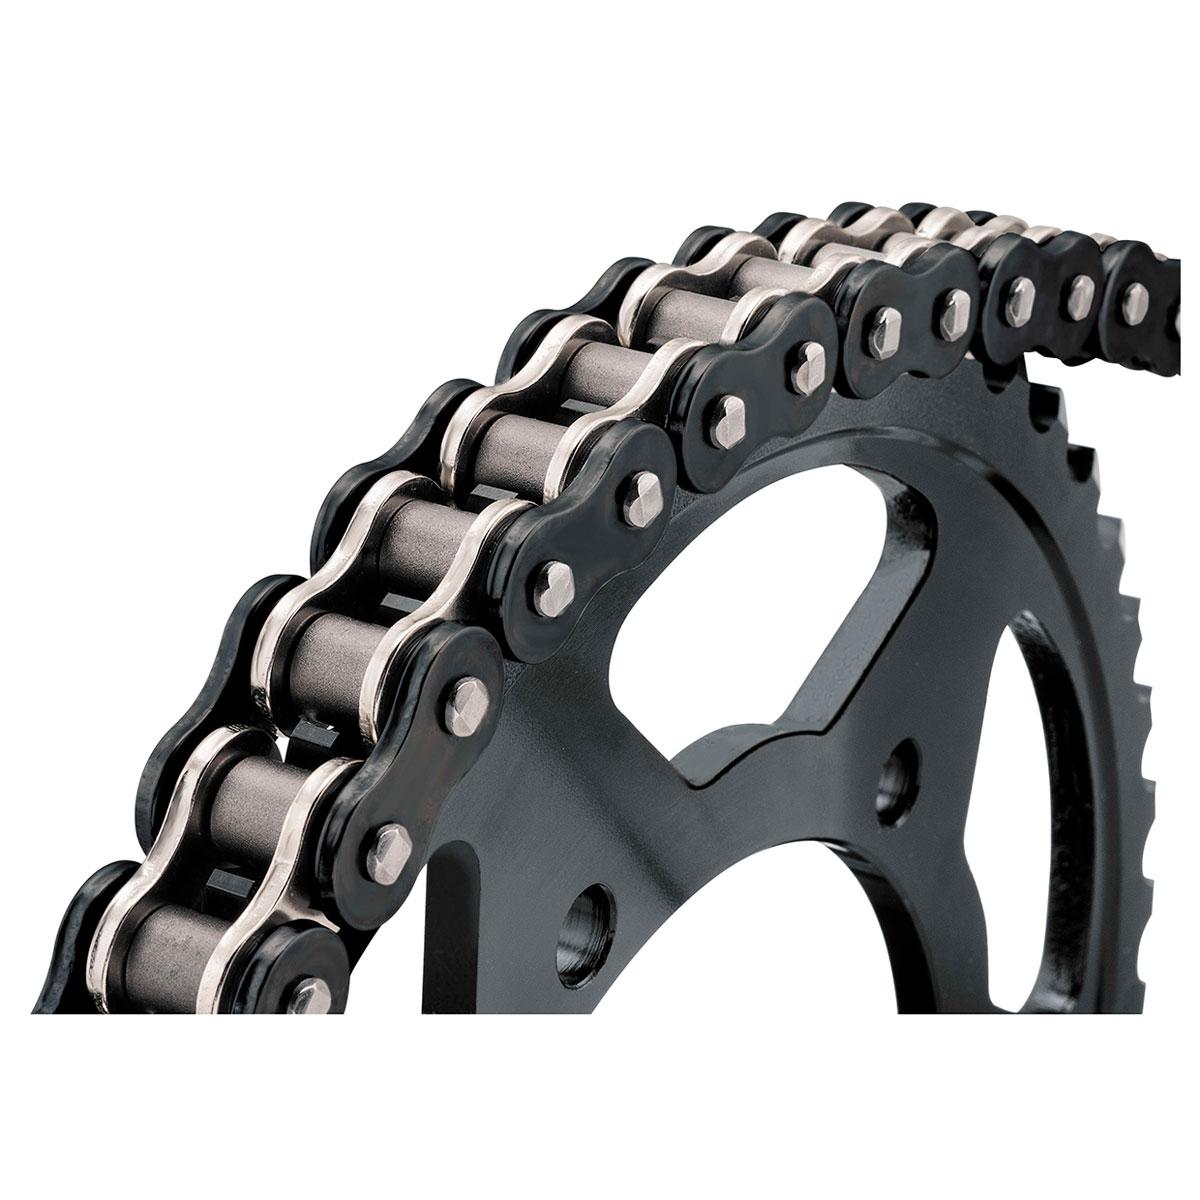 BikeMaster BMZR Z-Ring Chain Black/Chrome